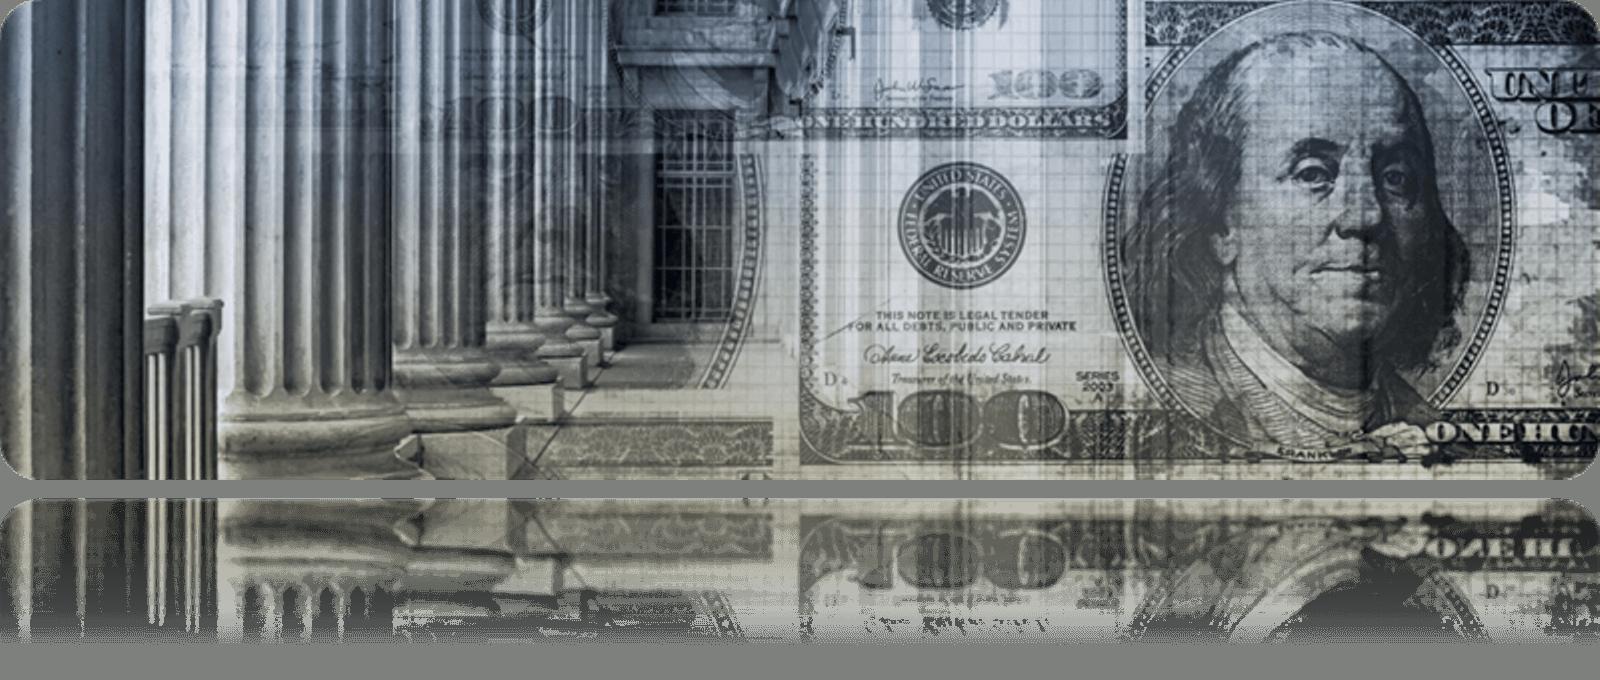 Vermögen Vermögensplanung Vermögensmanagement